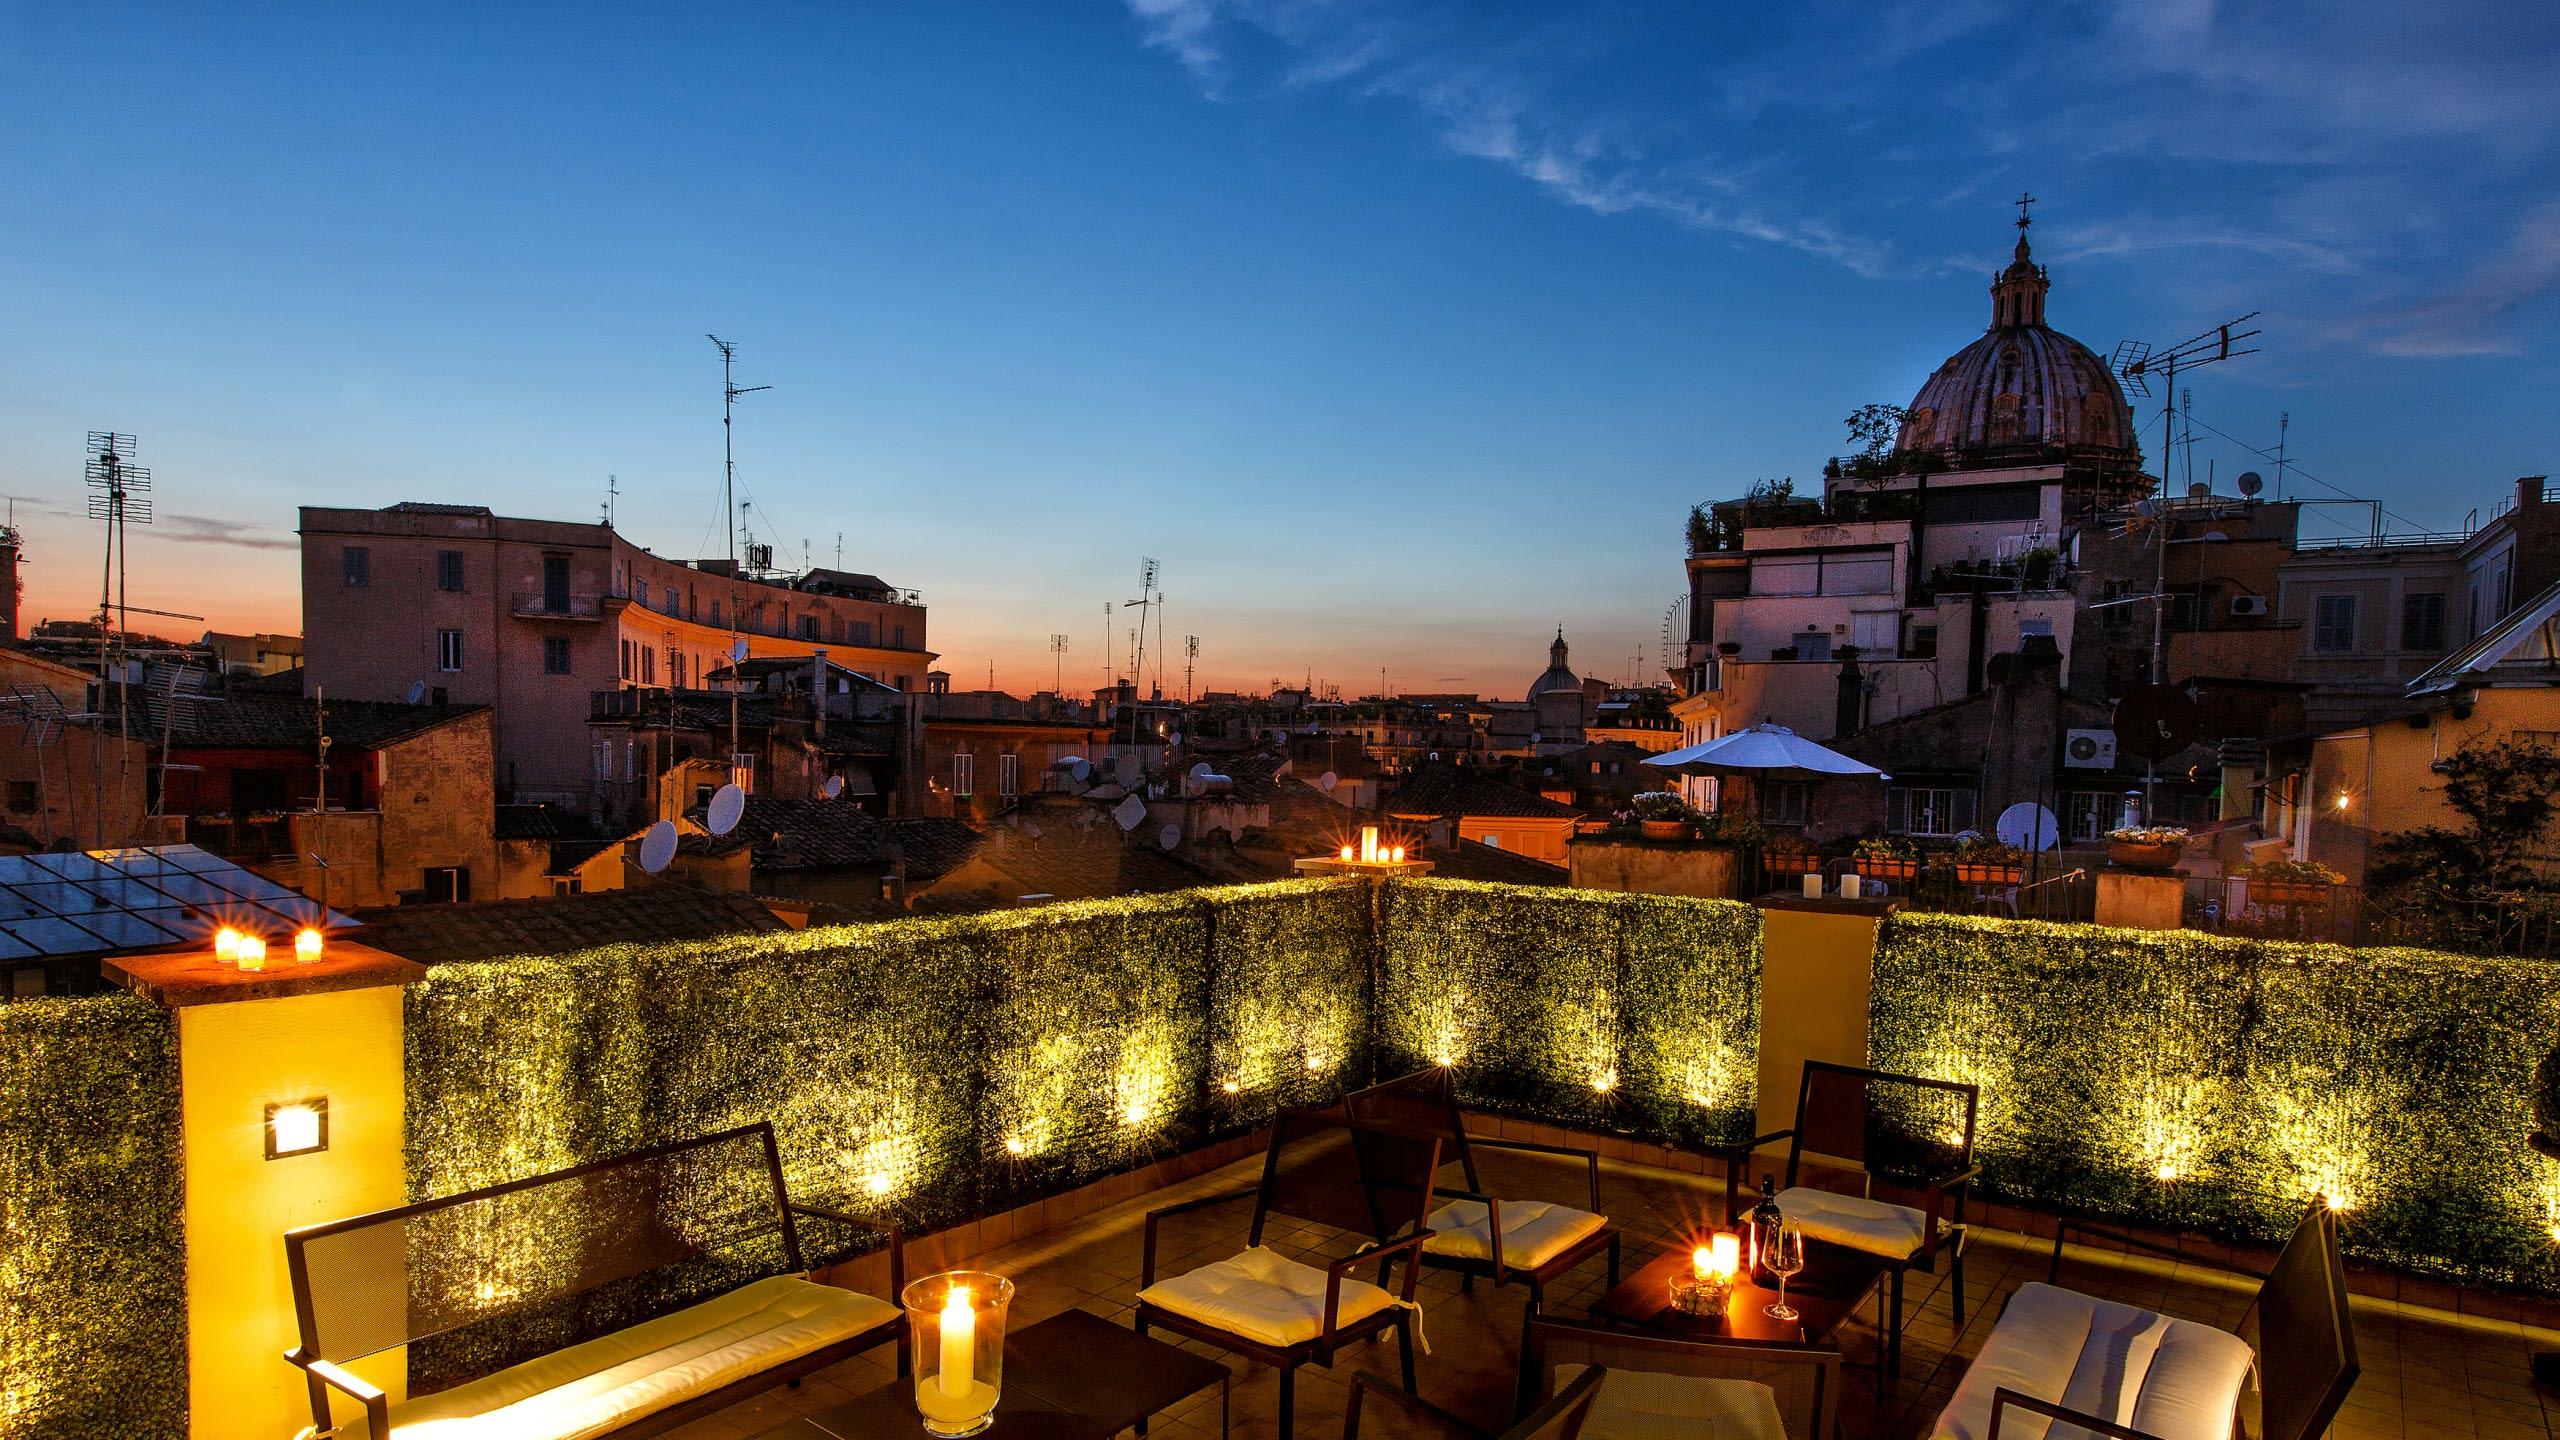 Hotel Smeraldo Rome Italy